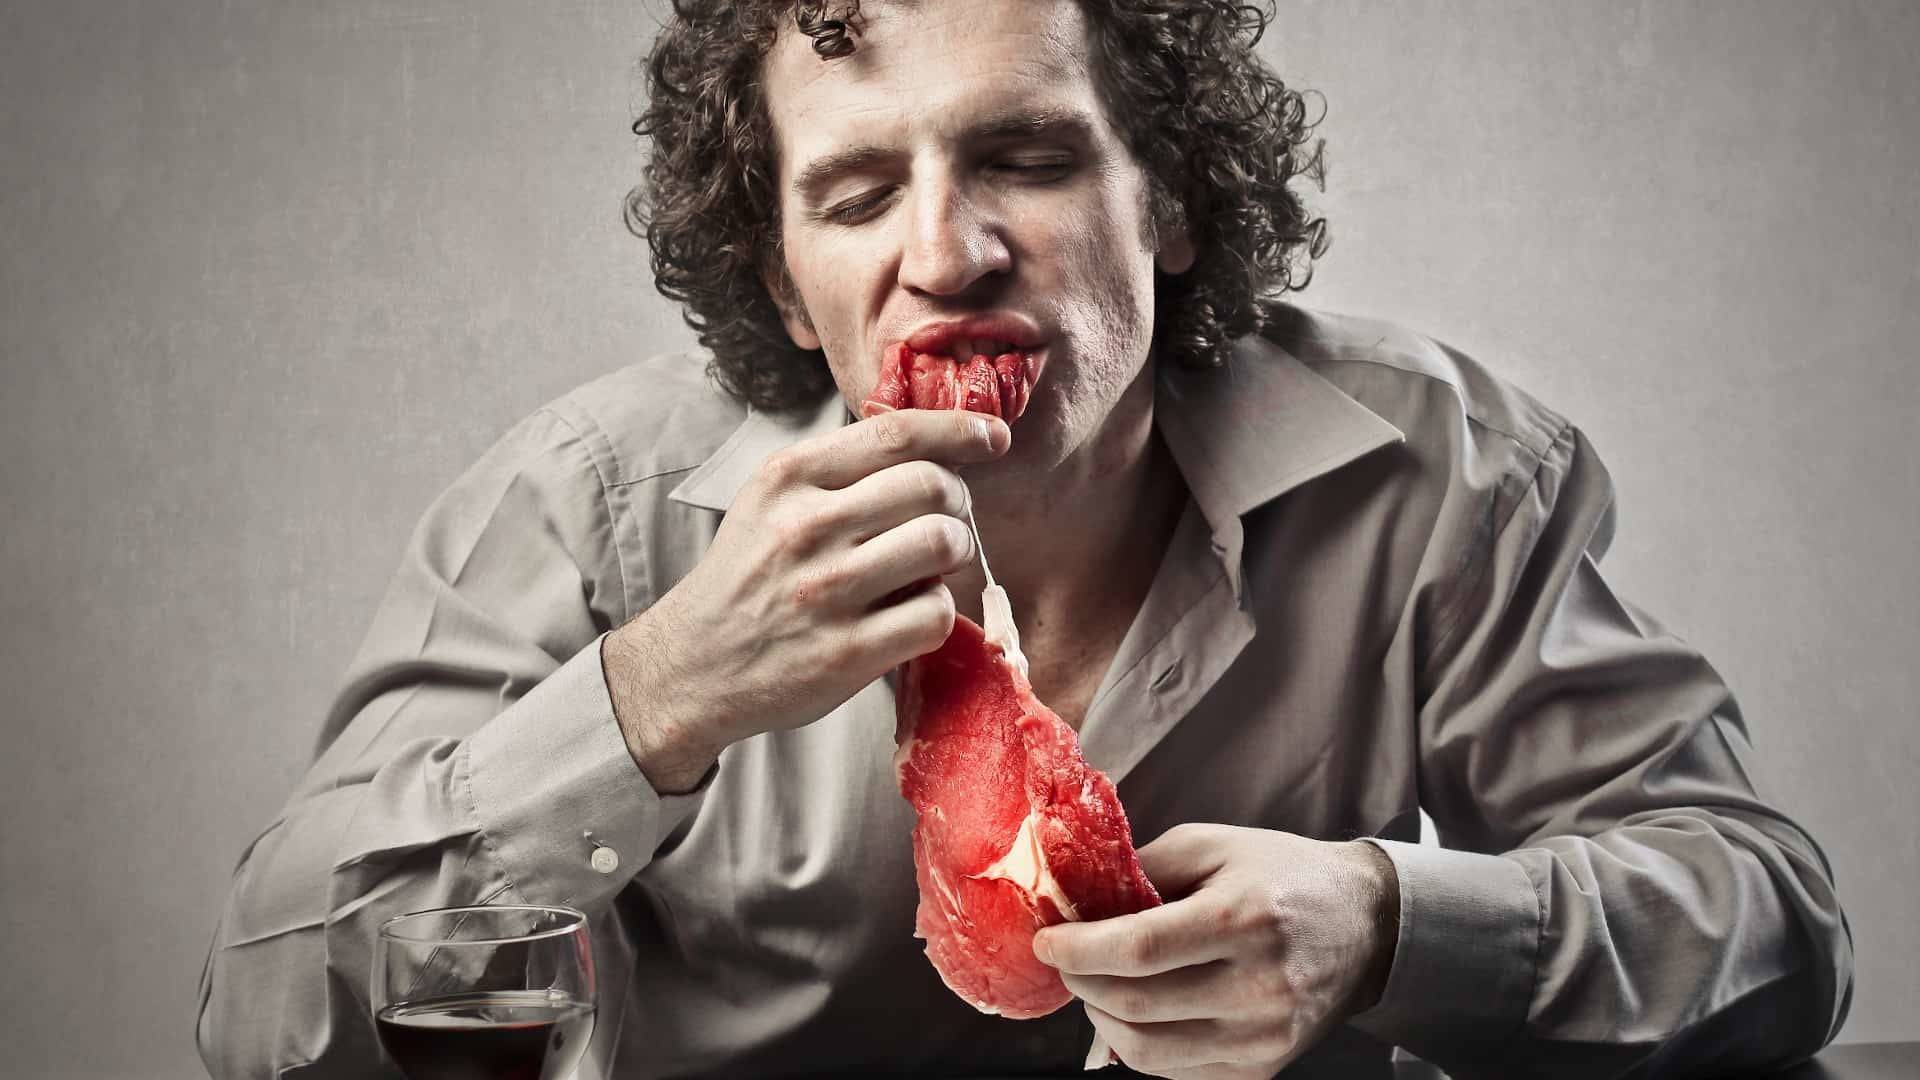 Top 11 Biggest Mistakes Eating Steak (That Everyone Makes)